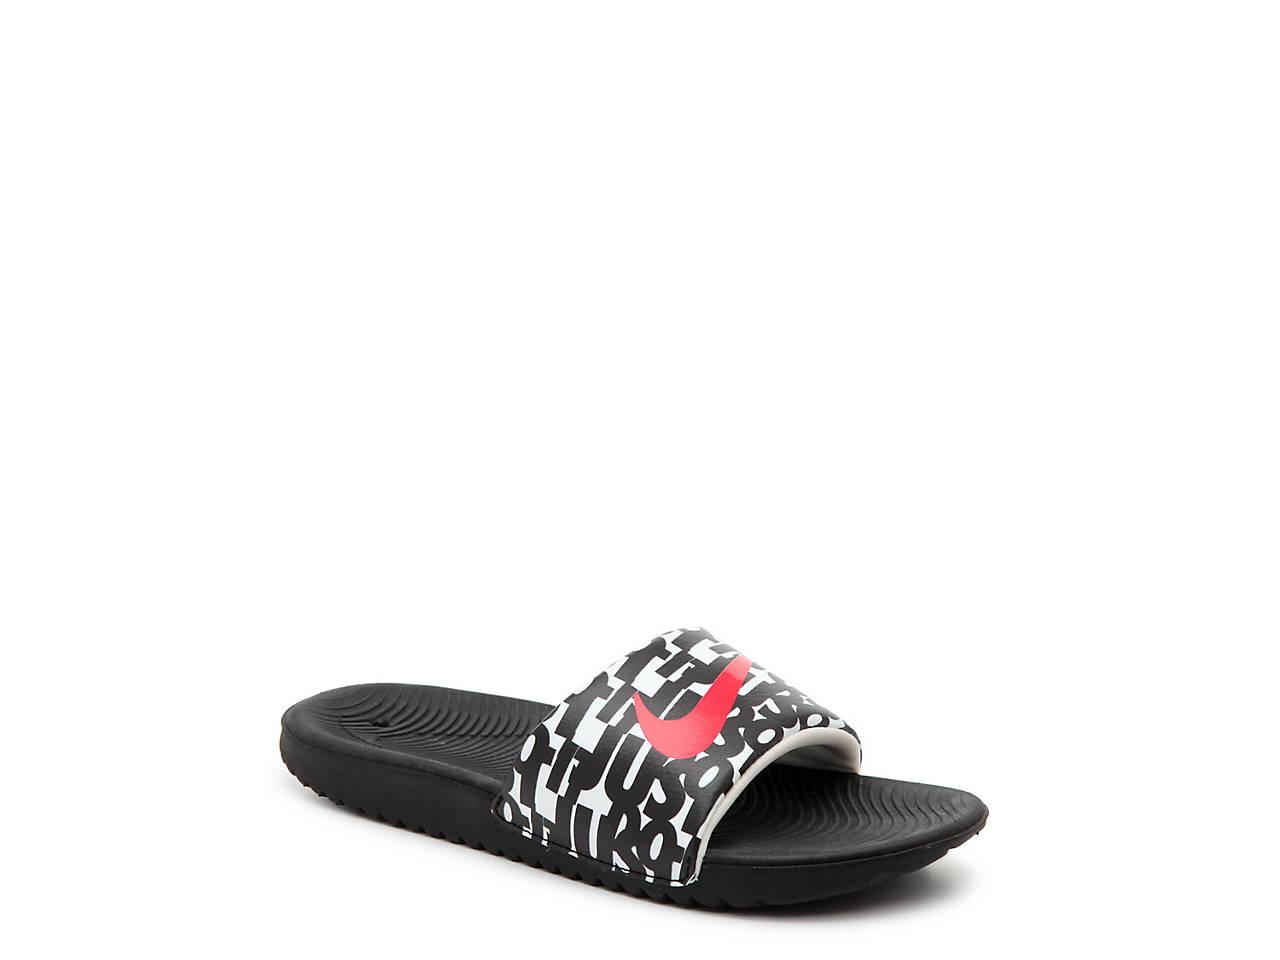 99ecda69d Nike Kawa Toddler   Youth Slide Sandal Kids Shoes